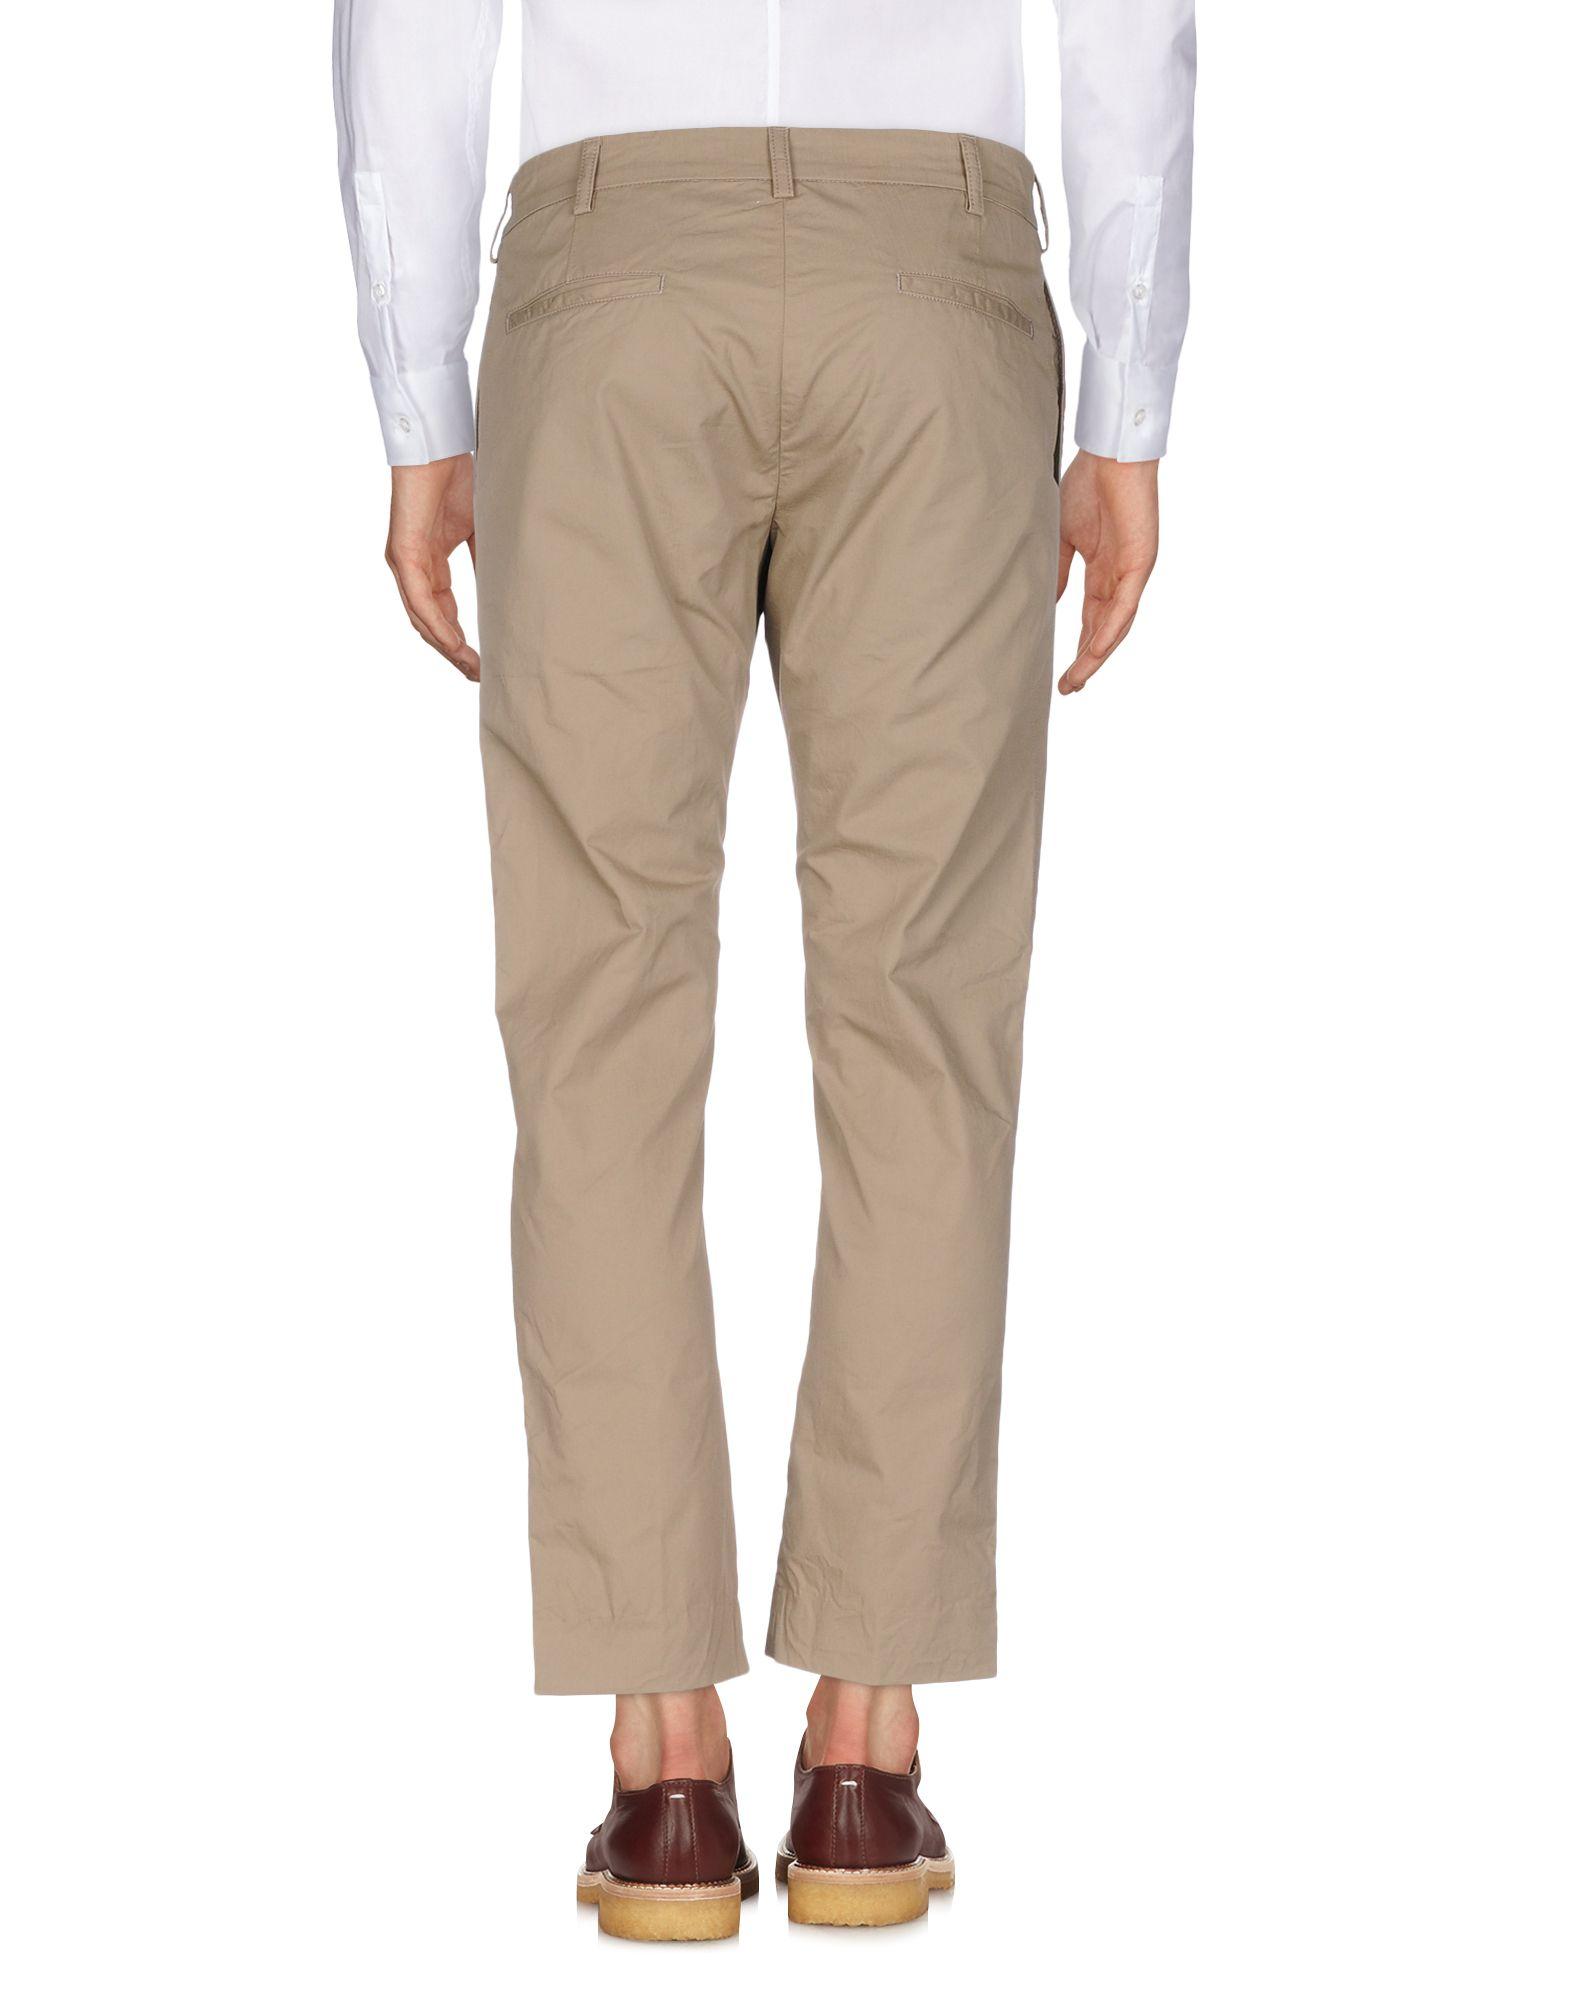 Pantalone bianca Siviglia bianca Pantalone Uomo - 13123548BX 3c0e7e